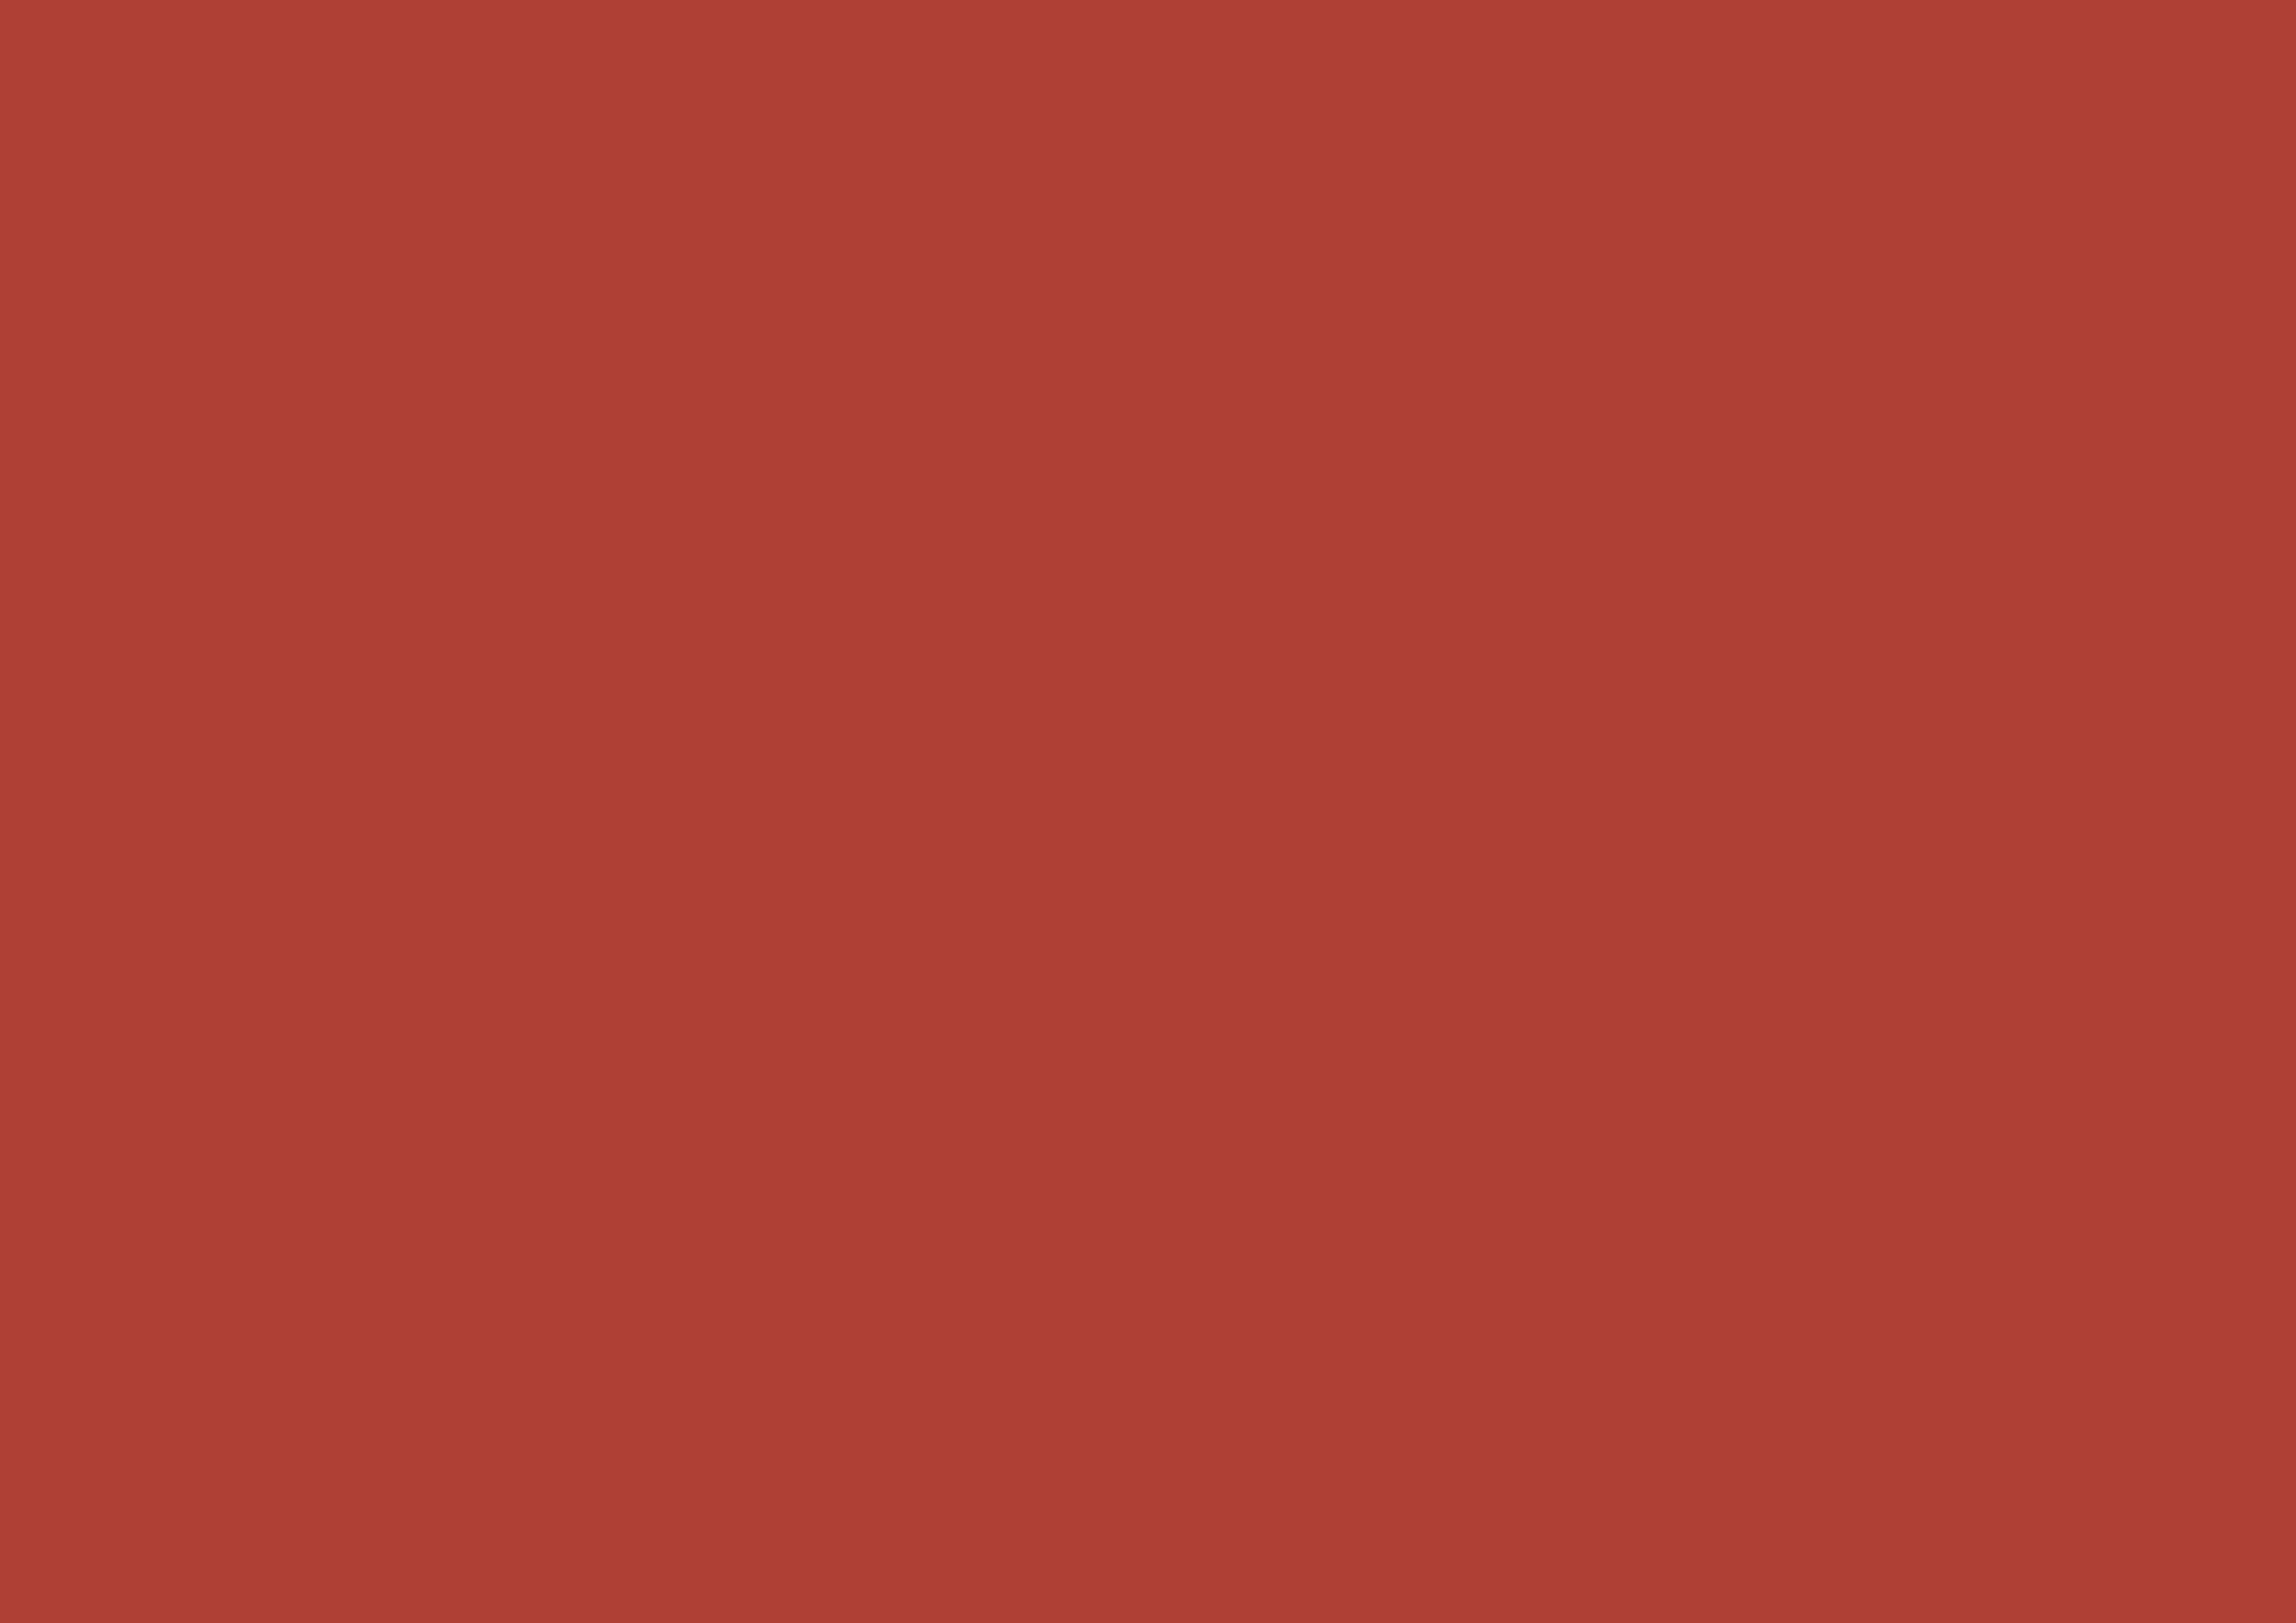 3508x2480 Pale Carmine Solid Color Background